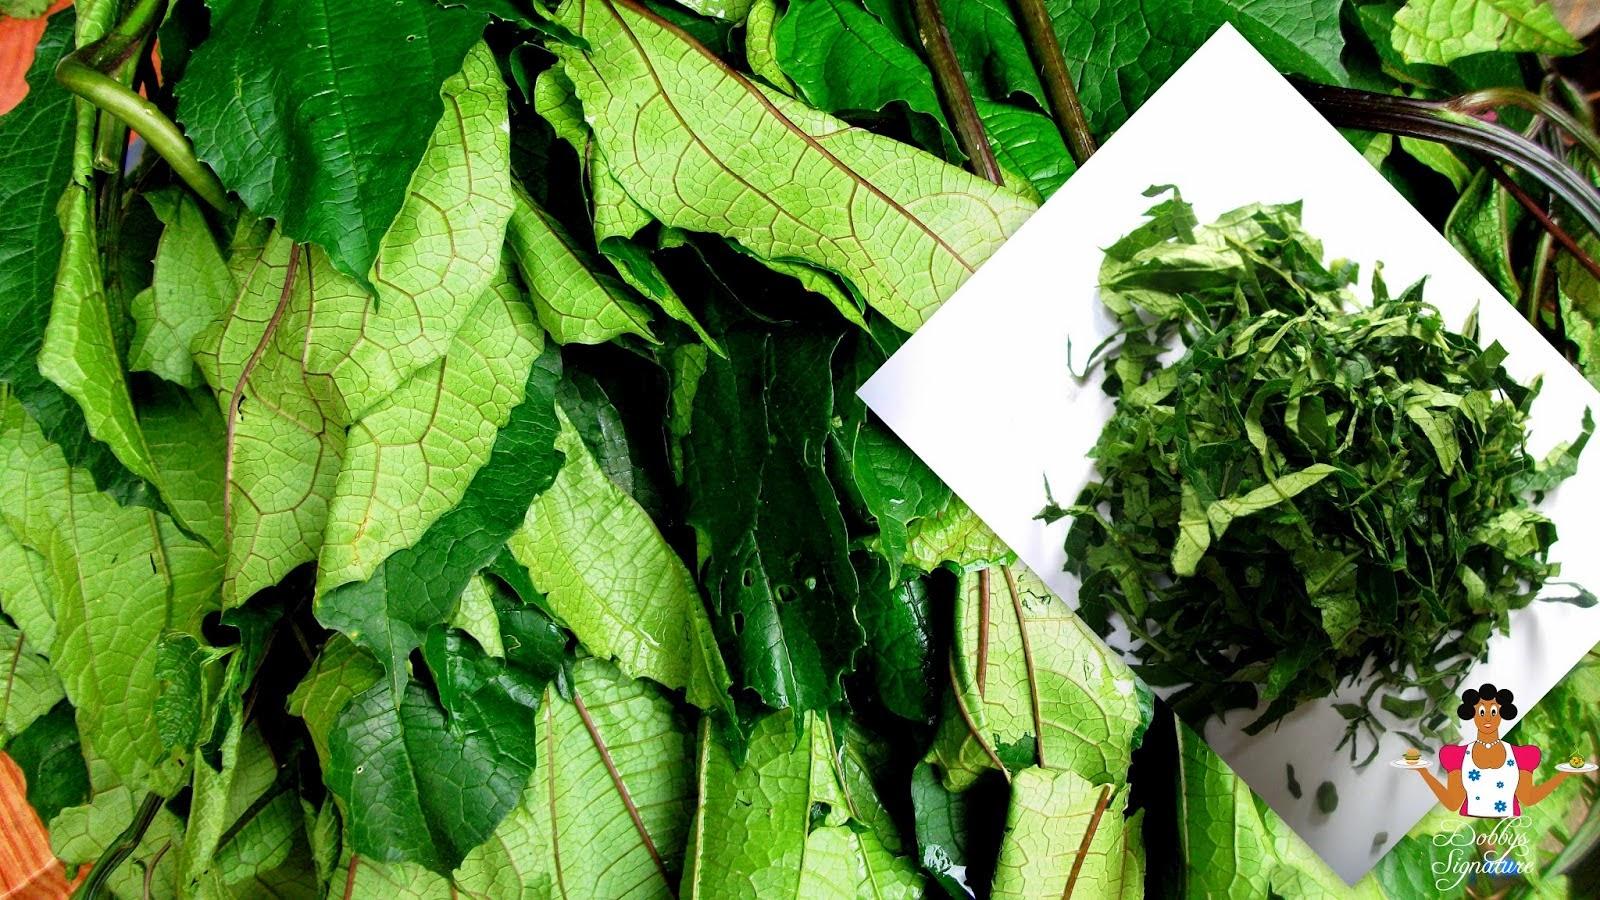 info wellness benefits of ugwu vegetable(fluted pumpkin